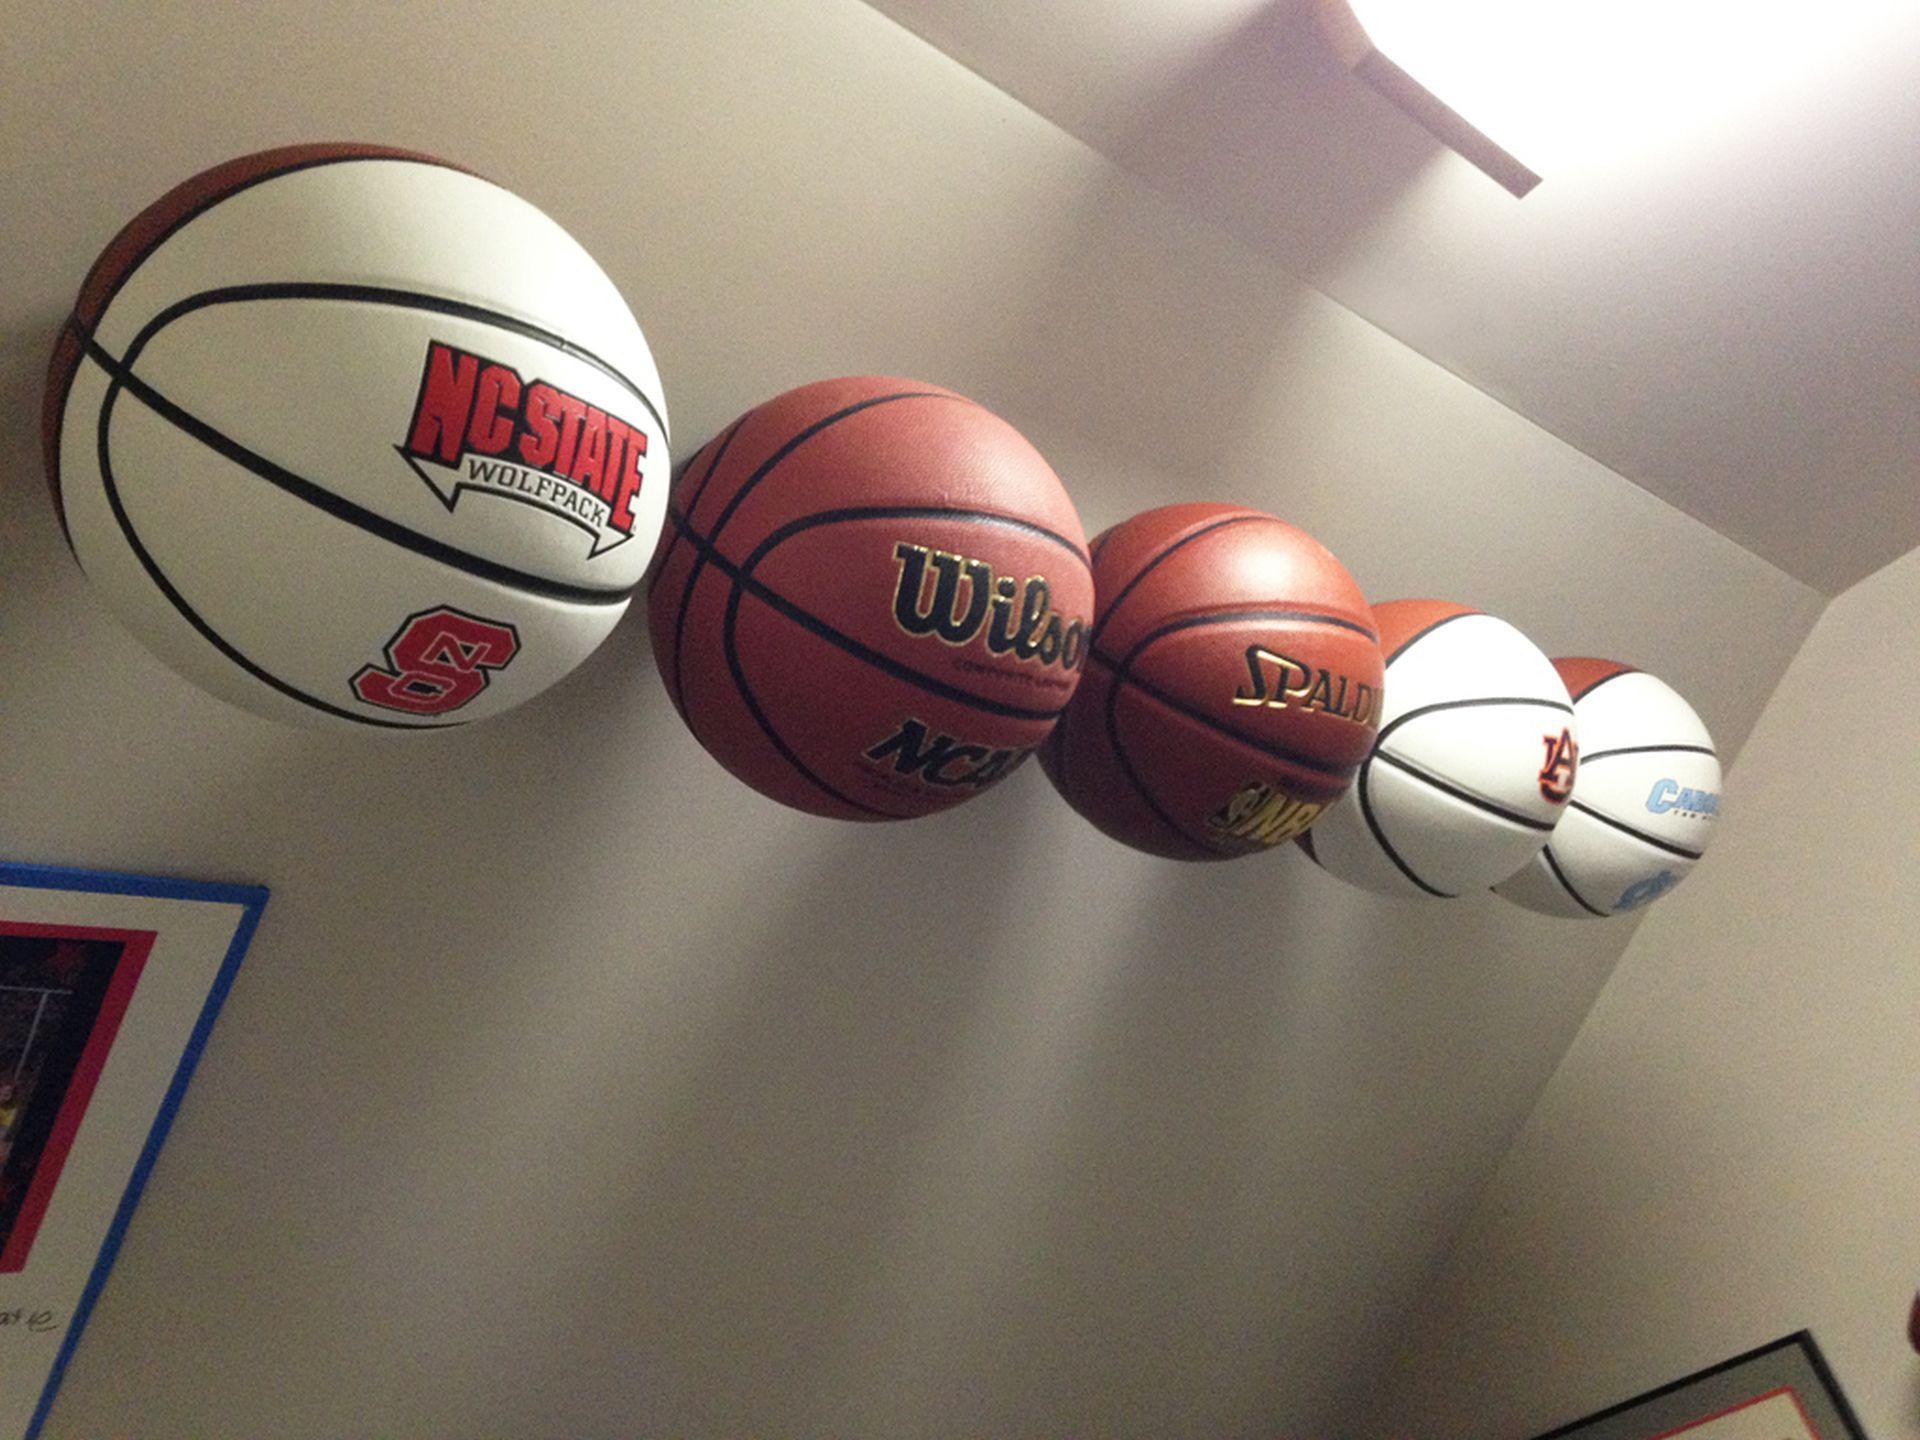 Invisi Ball Wall Mount Basketball Dallin Boys